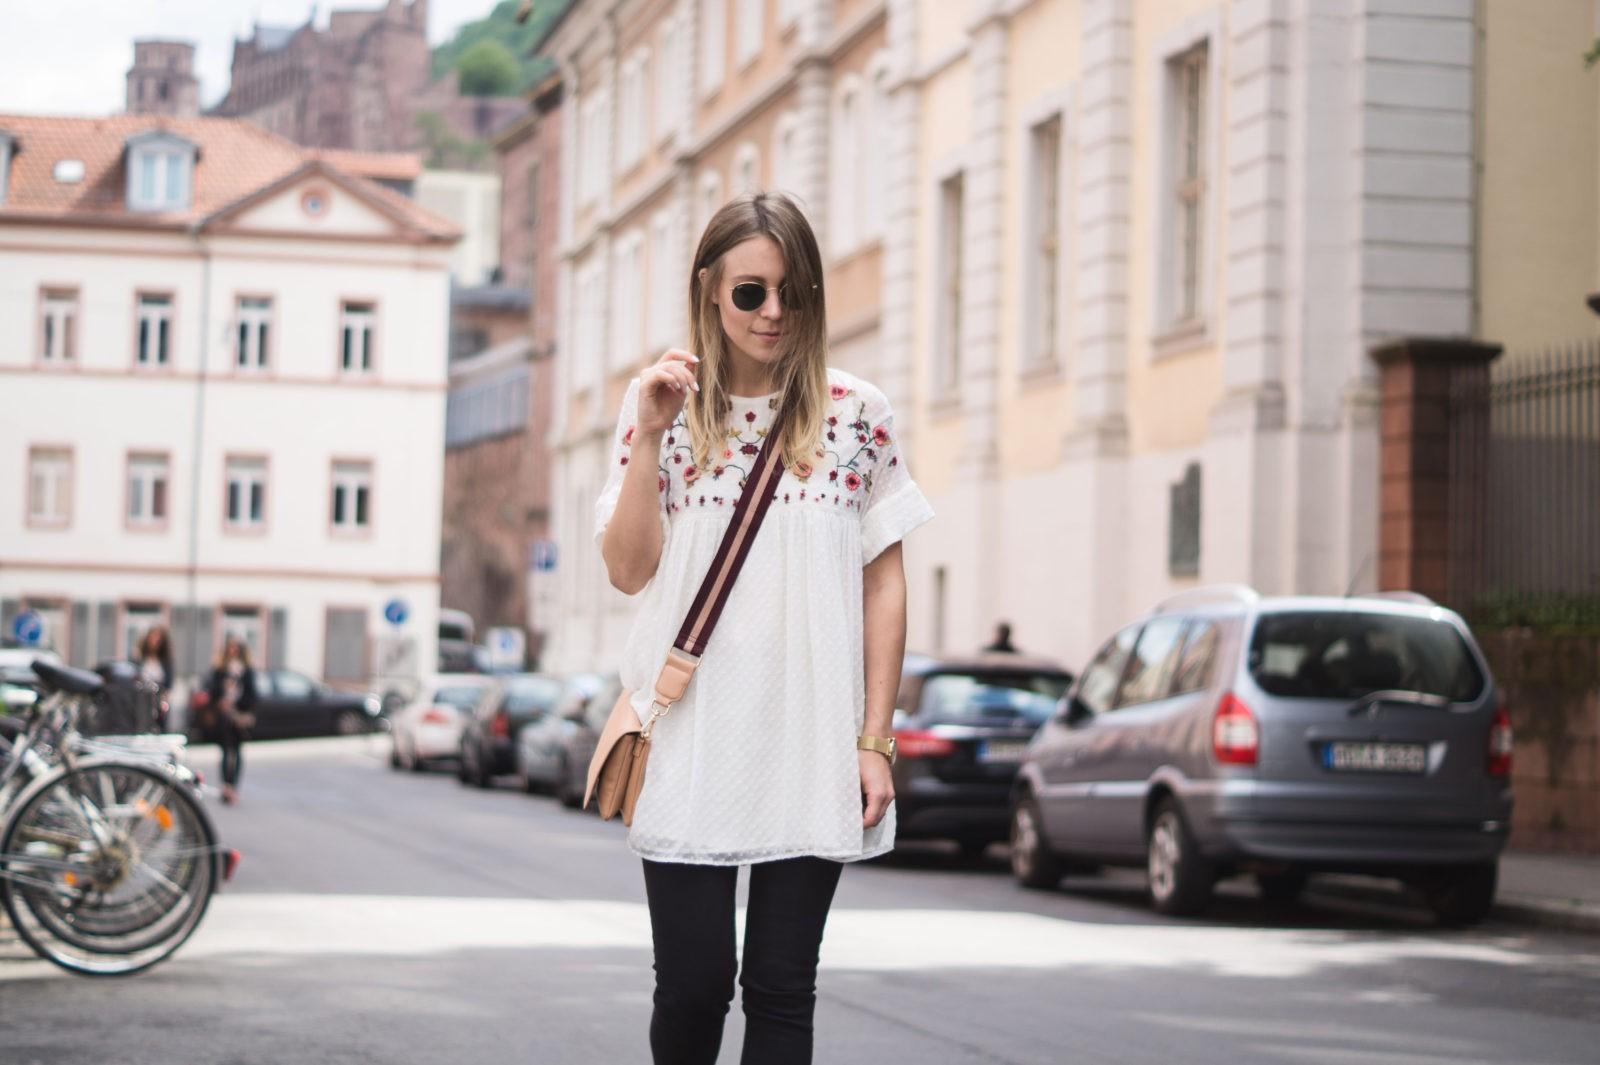 Floral Summer Dress Zara Jumpsuit Black Loafers Pantoletten Sommerkleid Streetstyle Heidelberg Sariety Modeblog Streetstyle Statement